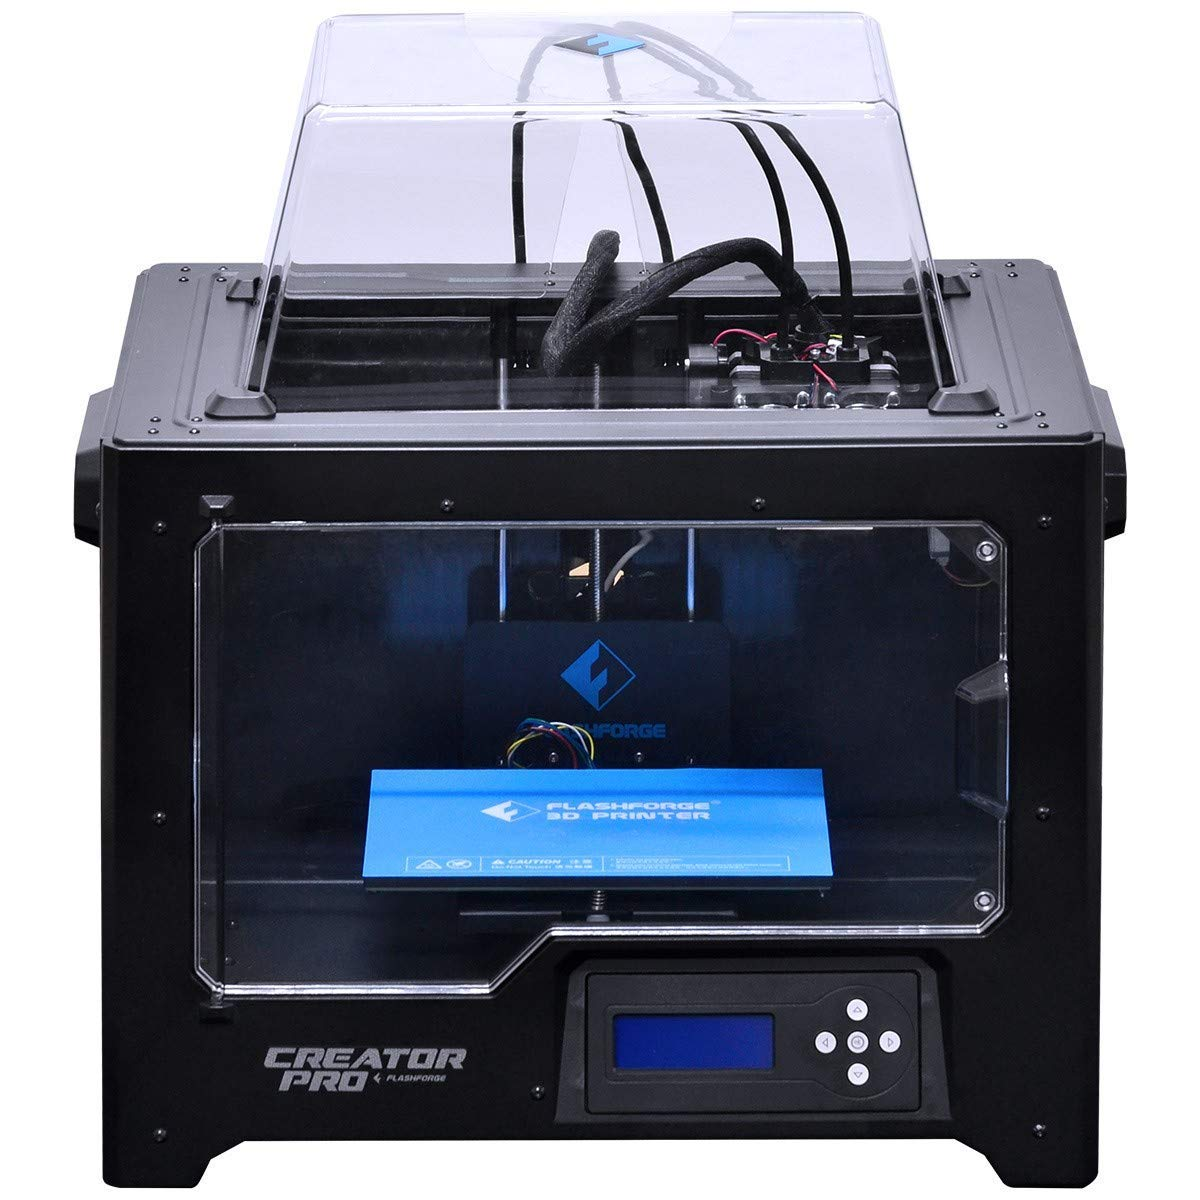 Flashforge Impresora 3D Creator Pro Impresora doble Extrusora con Optimizado Plate Construir y mejorada Holder Spool